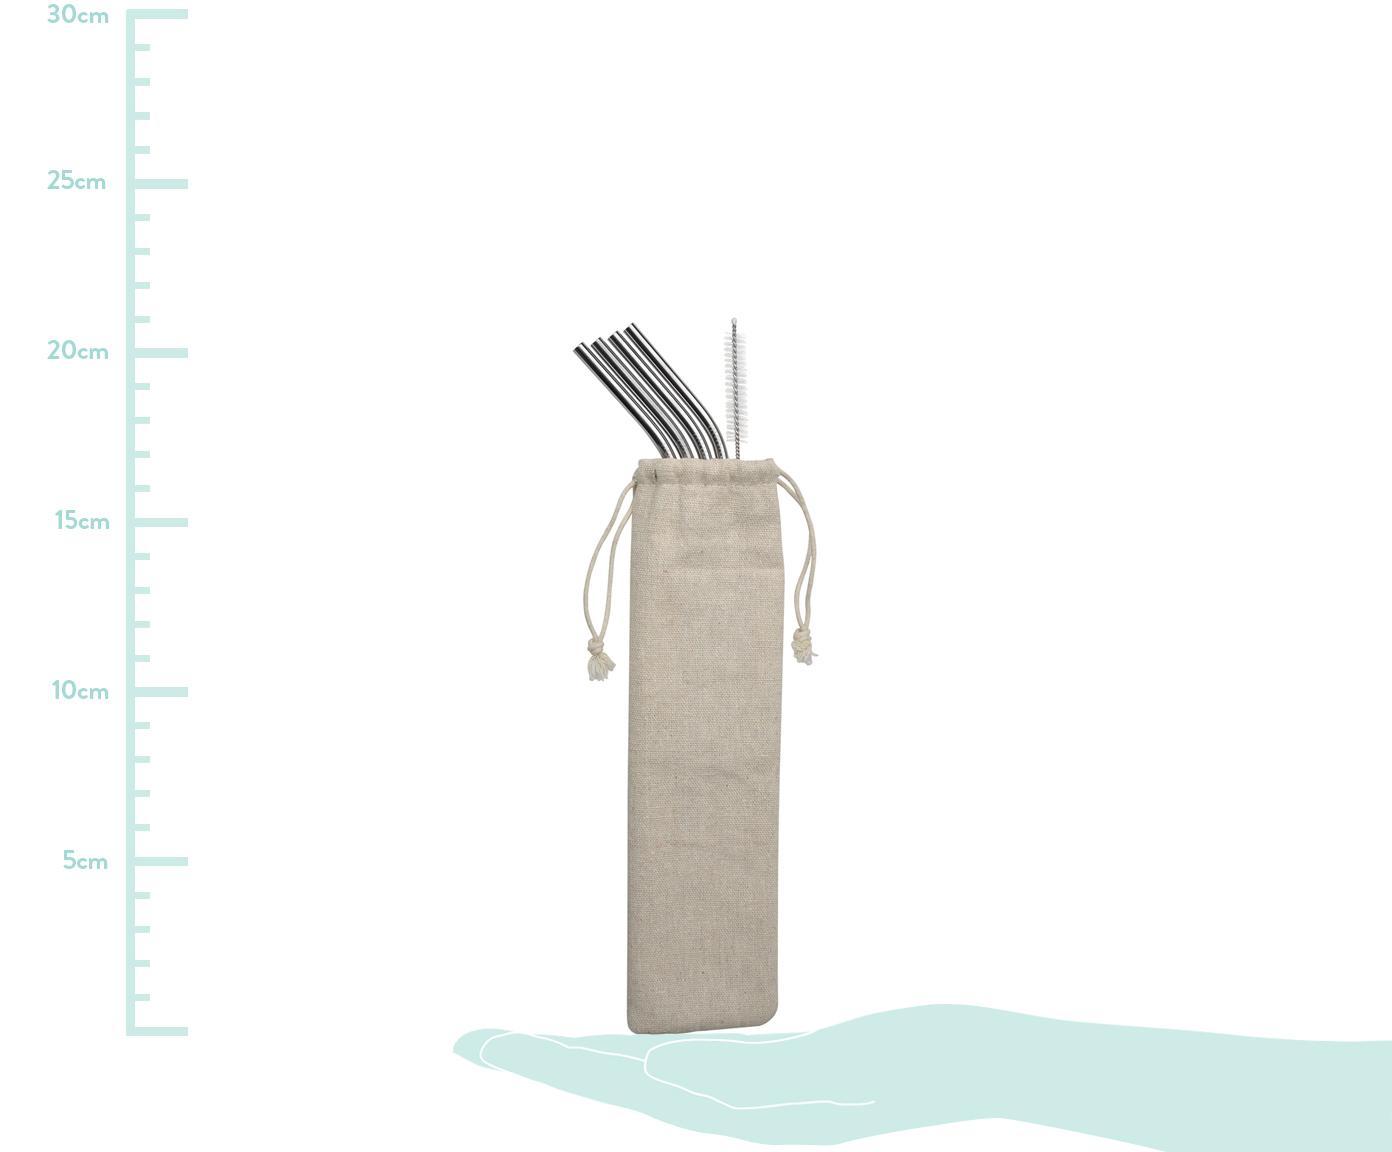 Strohhalm-Set Hosera, 6-tlg., Strohhalm: Edelstahl, Stahl, Beige, L 21 cm